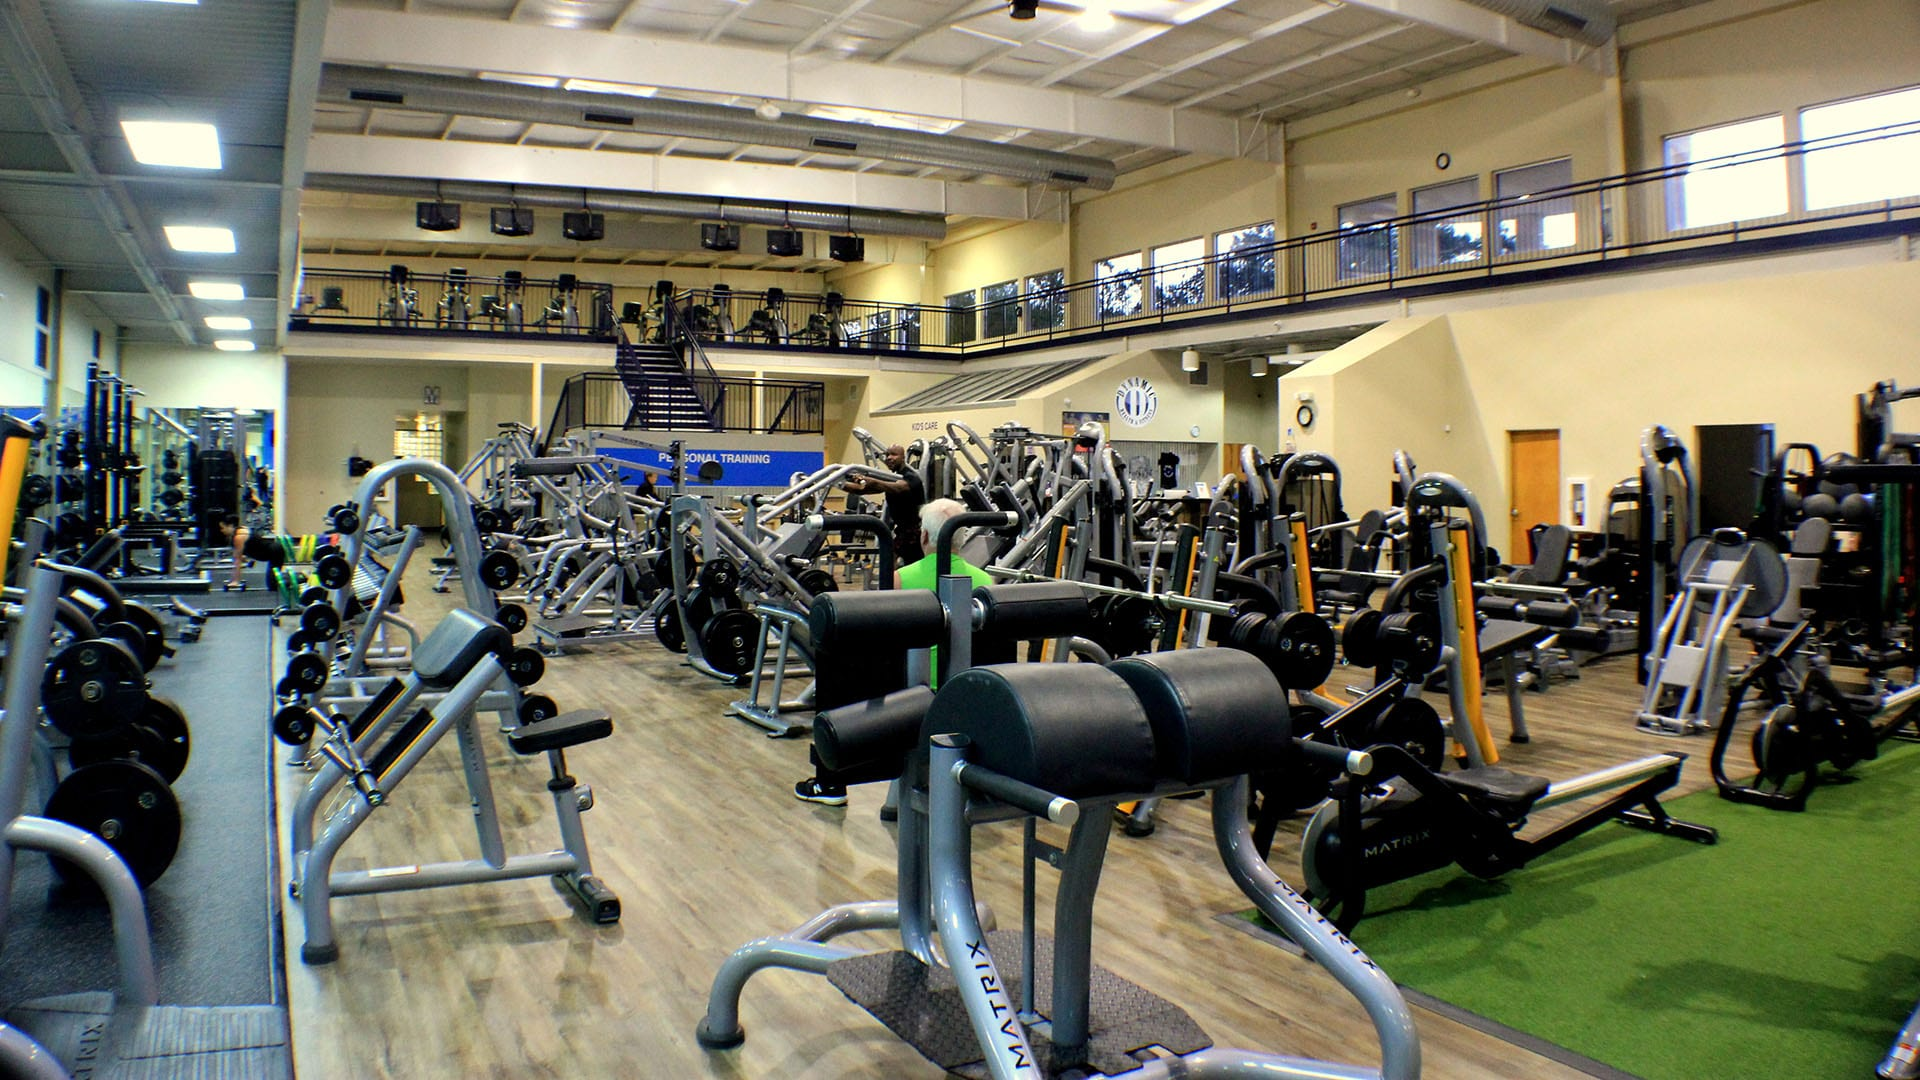 Charter Oak Fitness Facility - Dynamic Health & Fitness